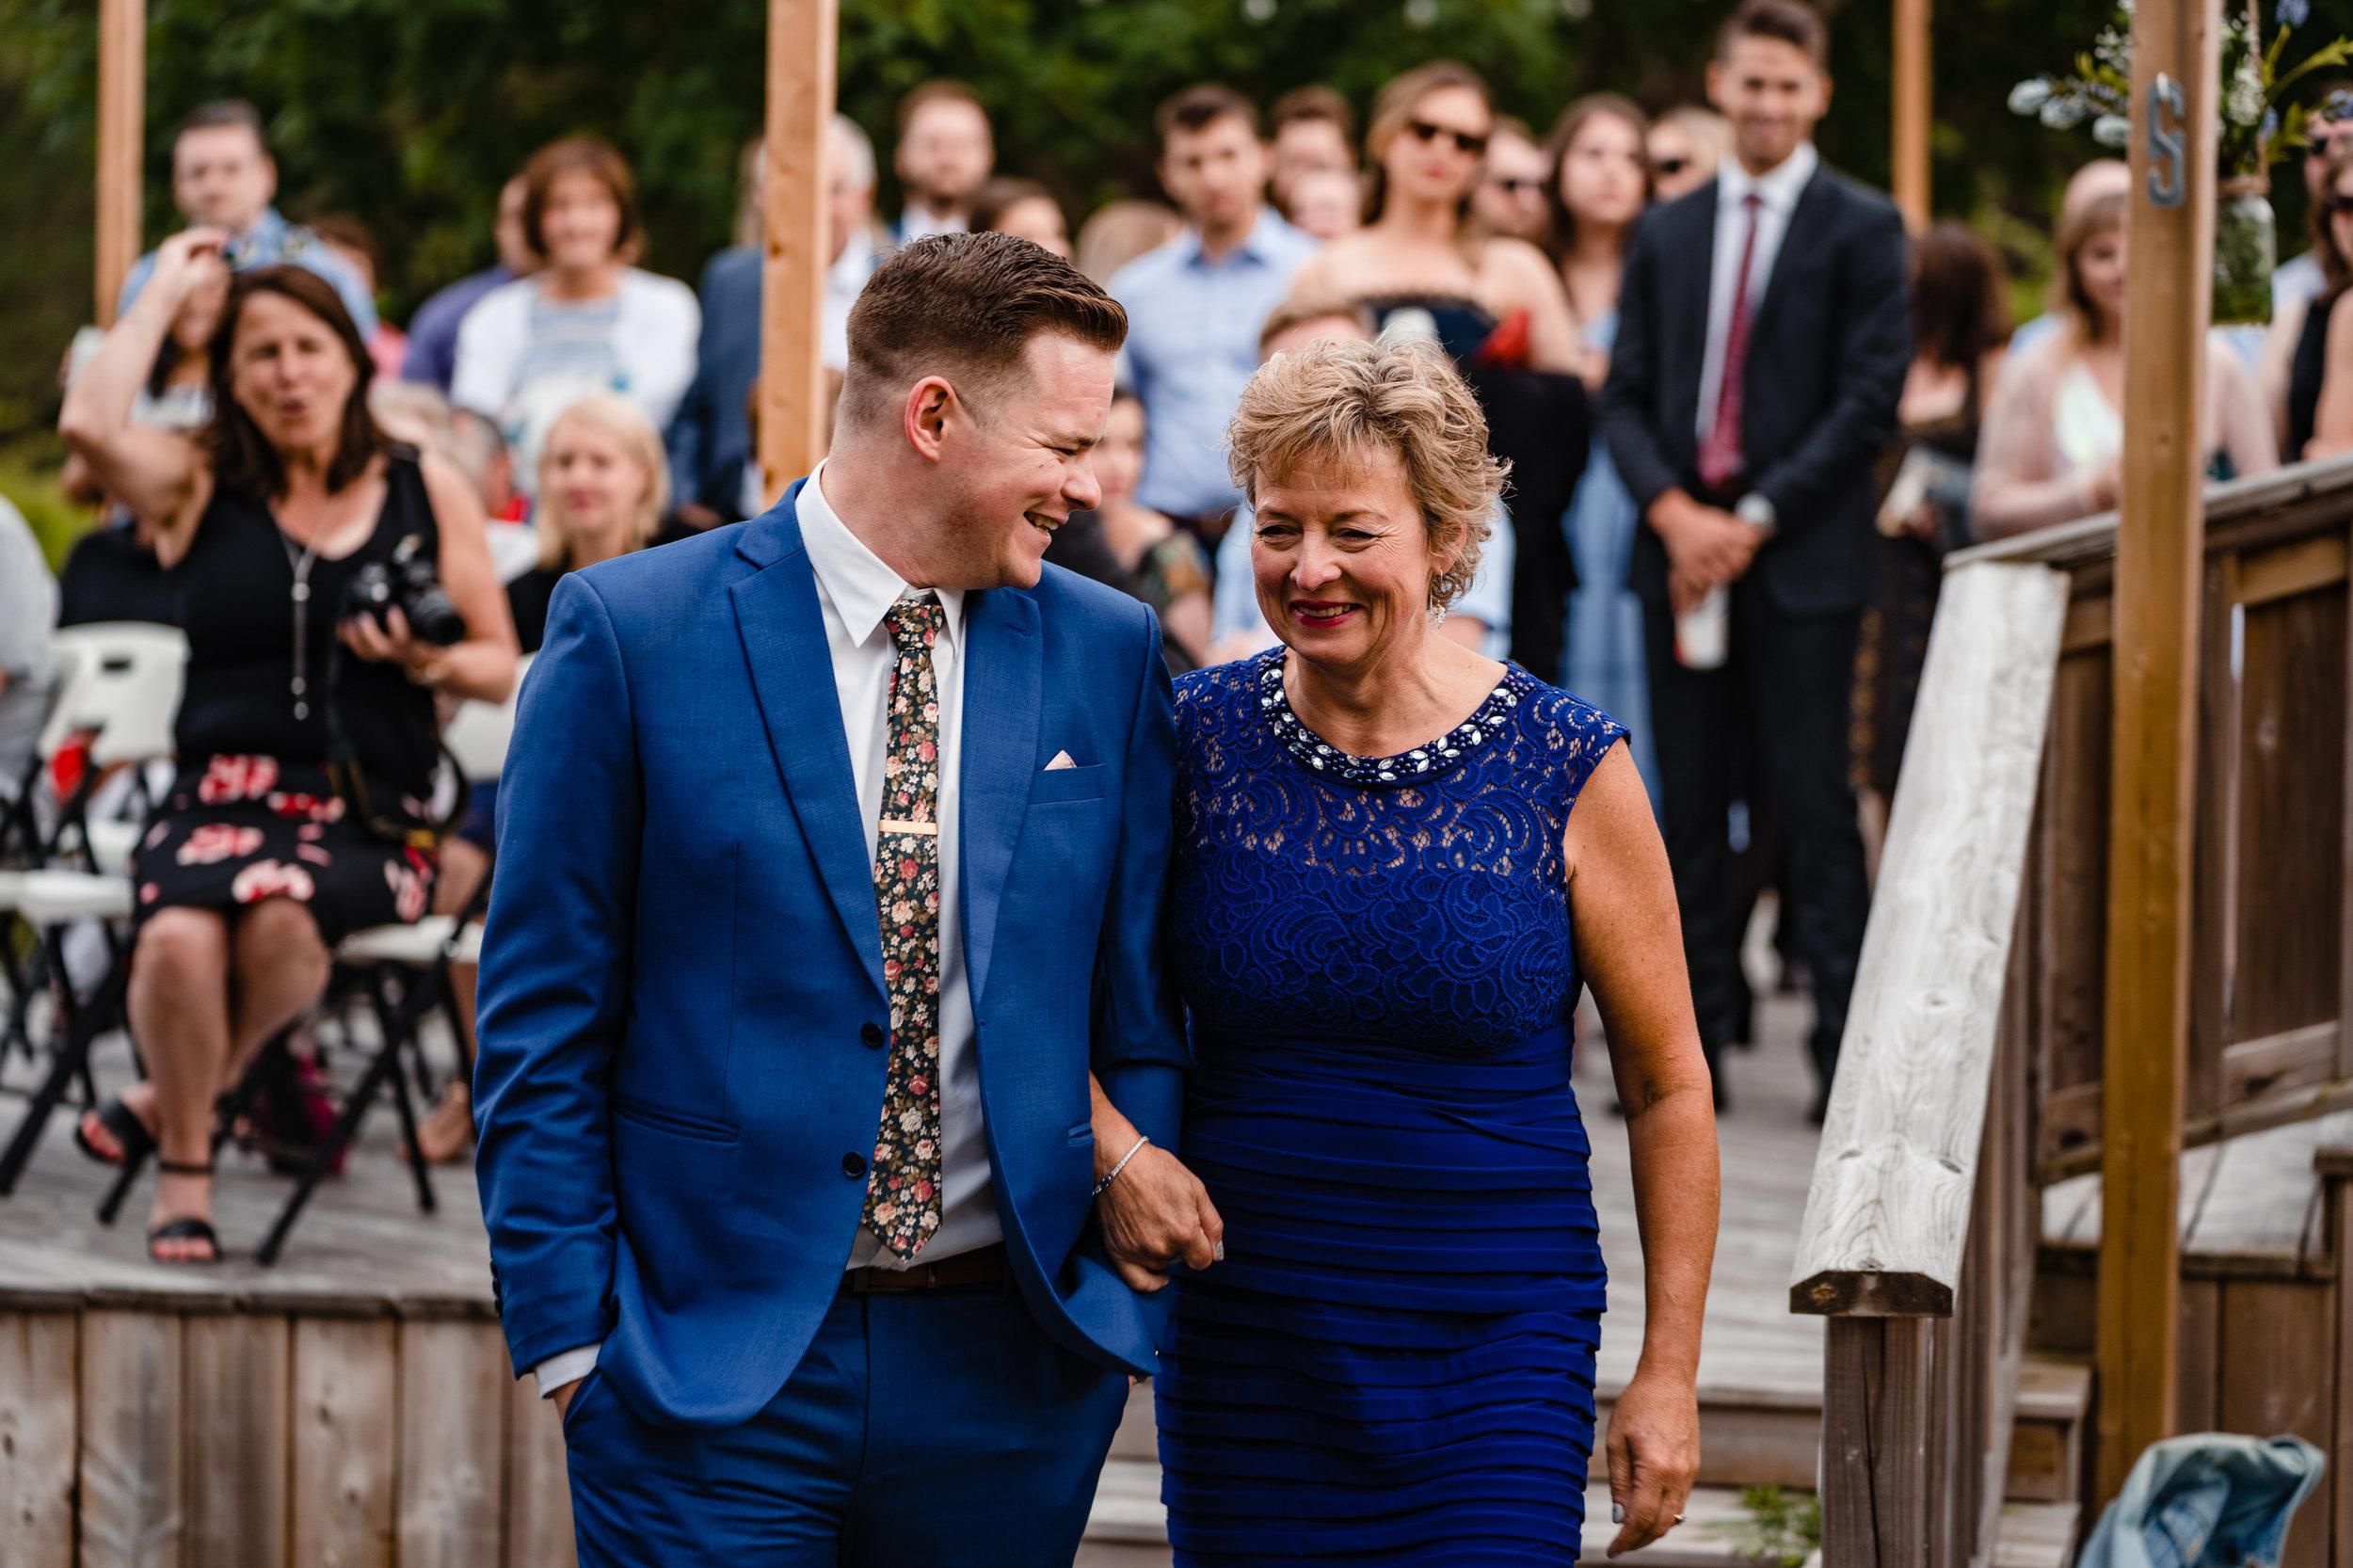 Janelle-Mitch-Halifax-Wedding-Nova-Scotia-Photography (100 of 163).jpg